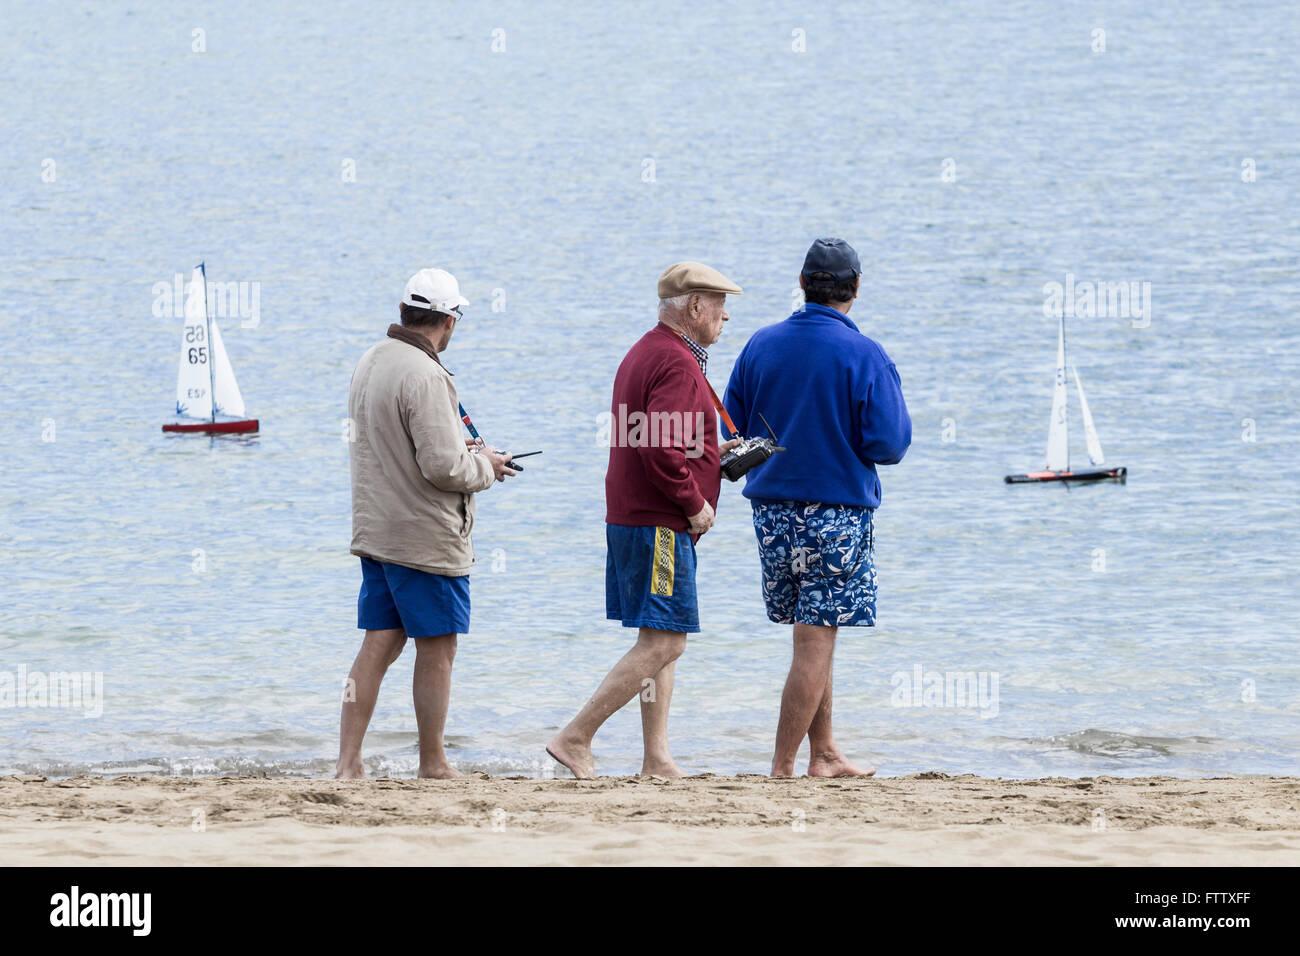 Elderly men in Spain walking along beach racing radio controlled yachts. - Stock Image